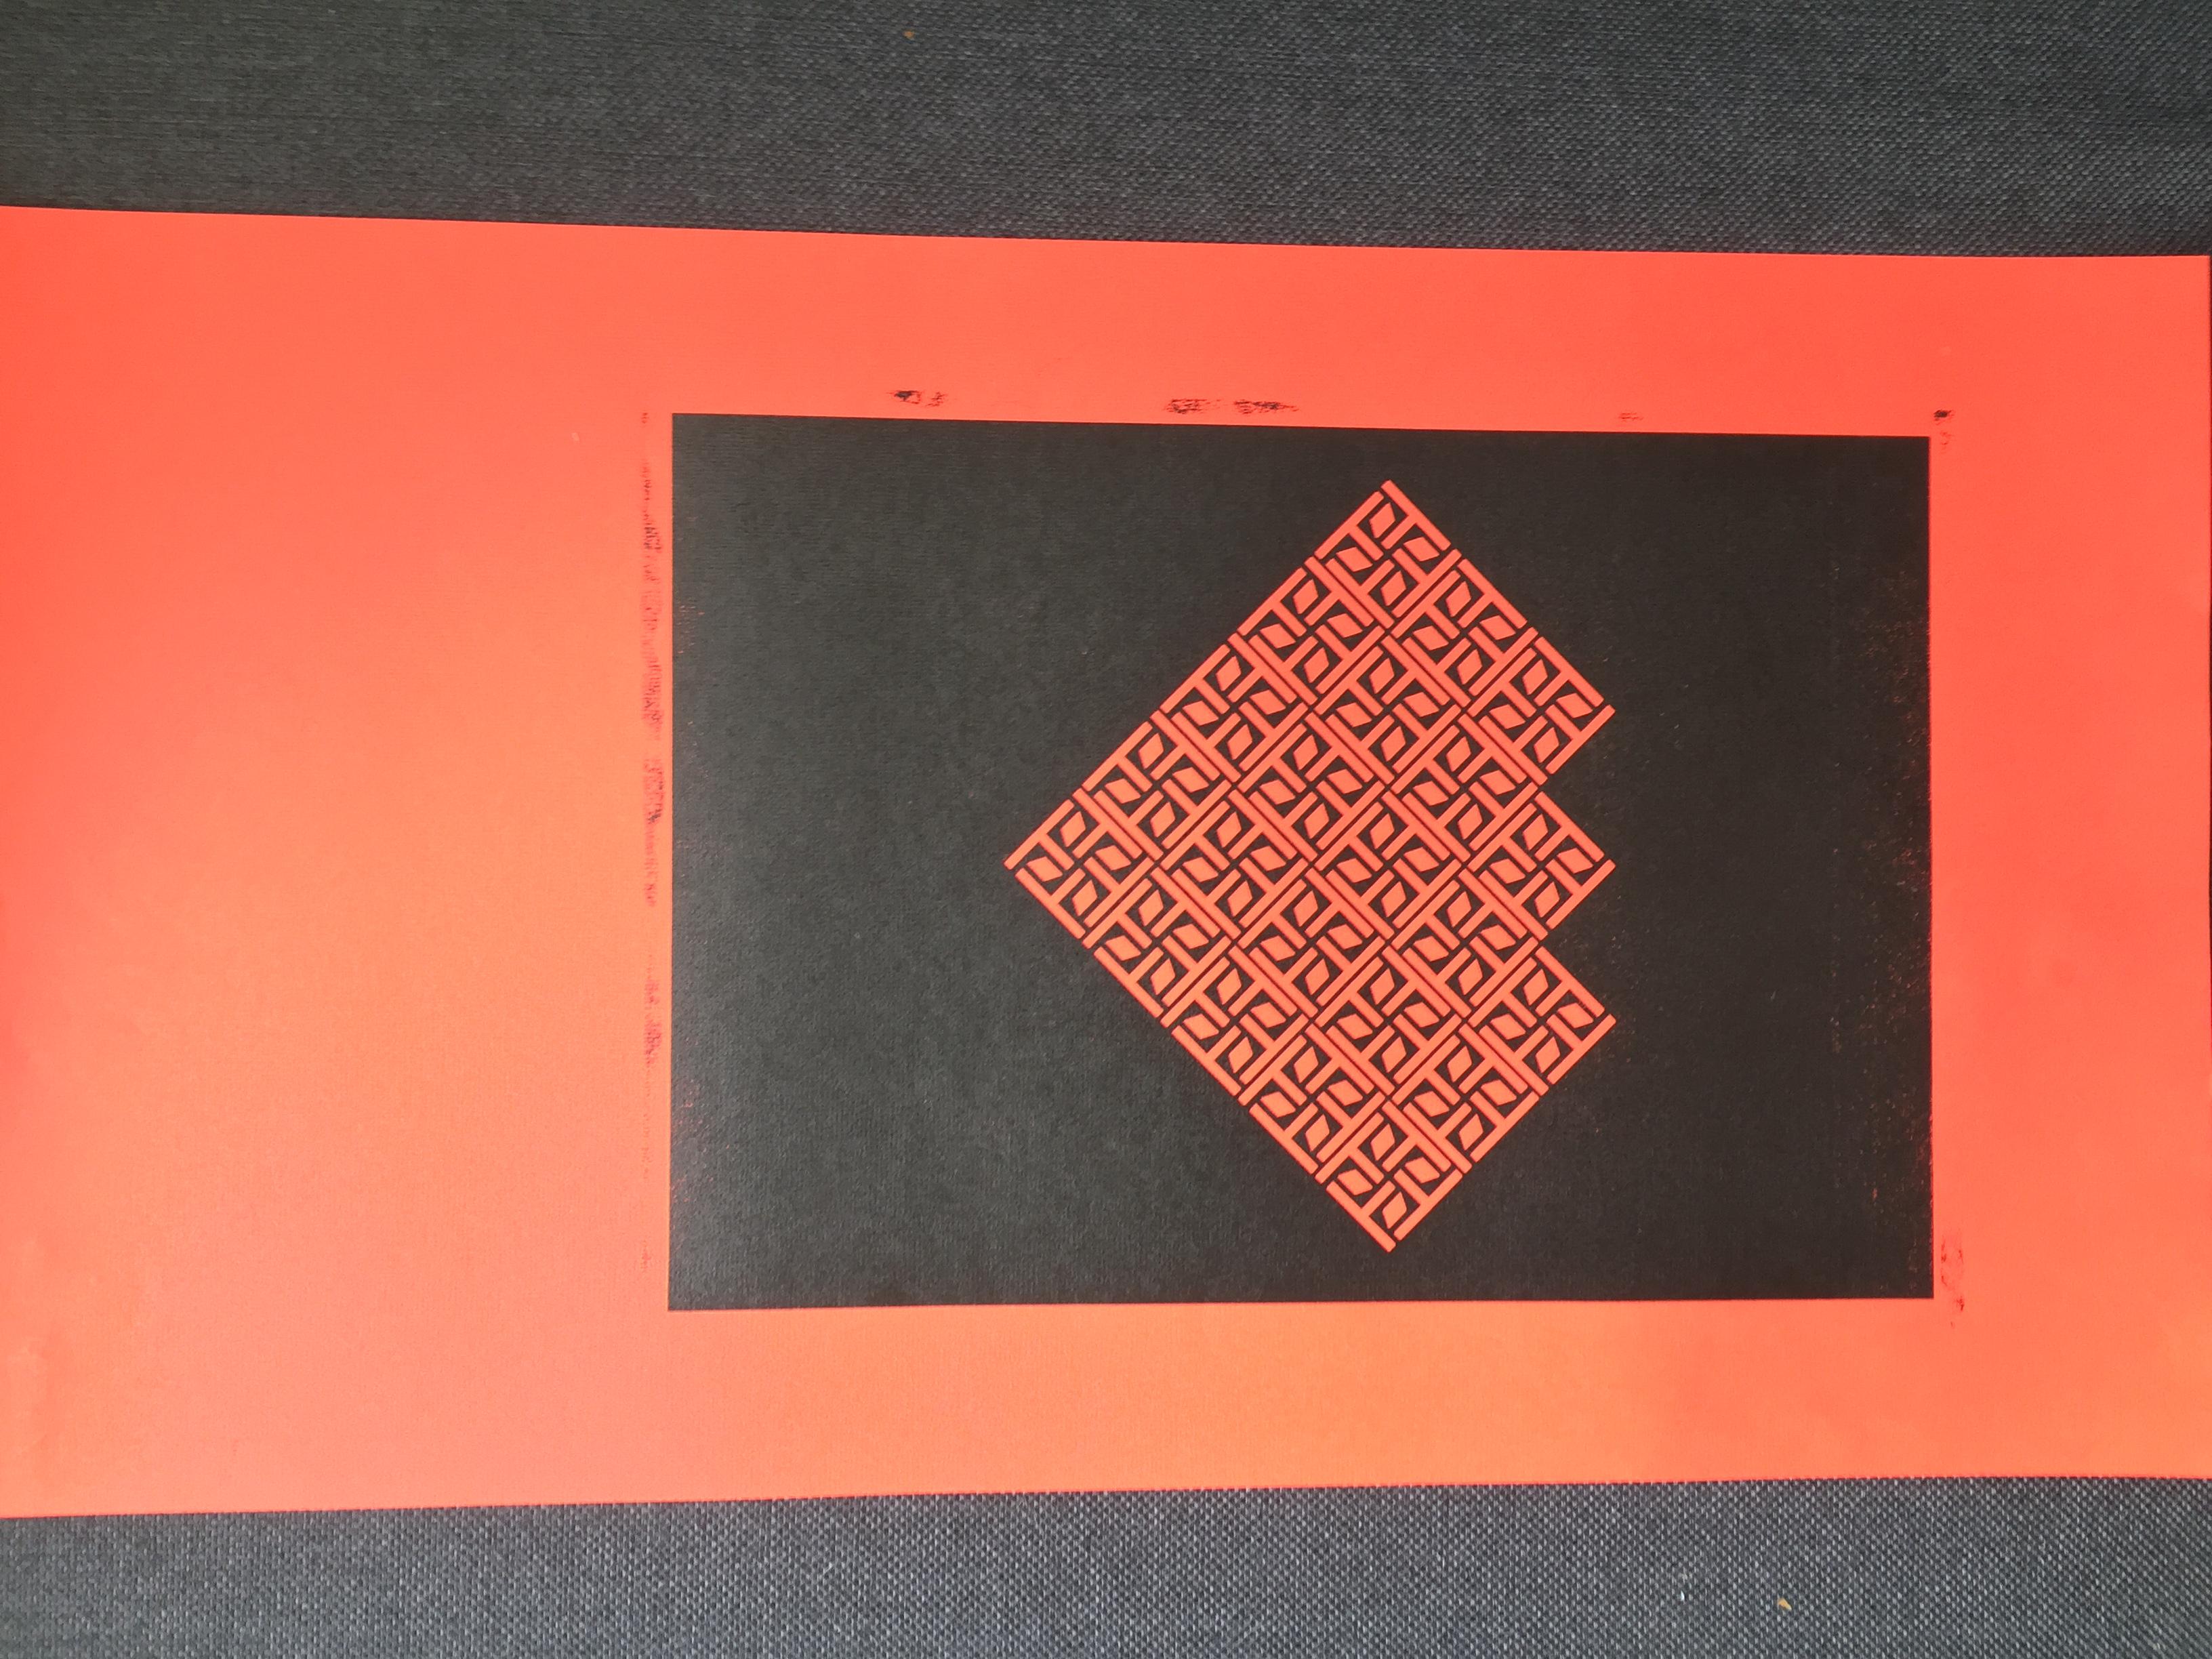 Fragment protoprint